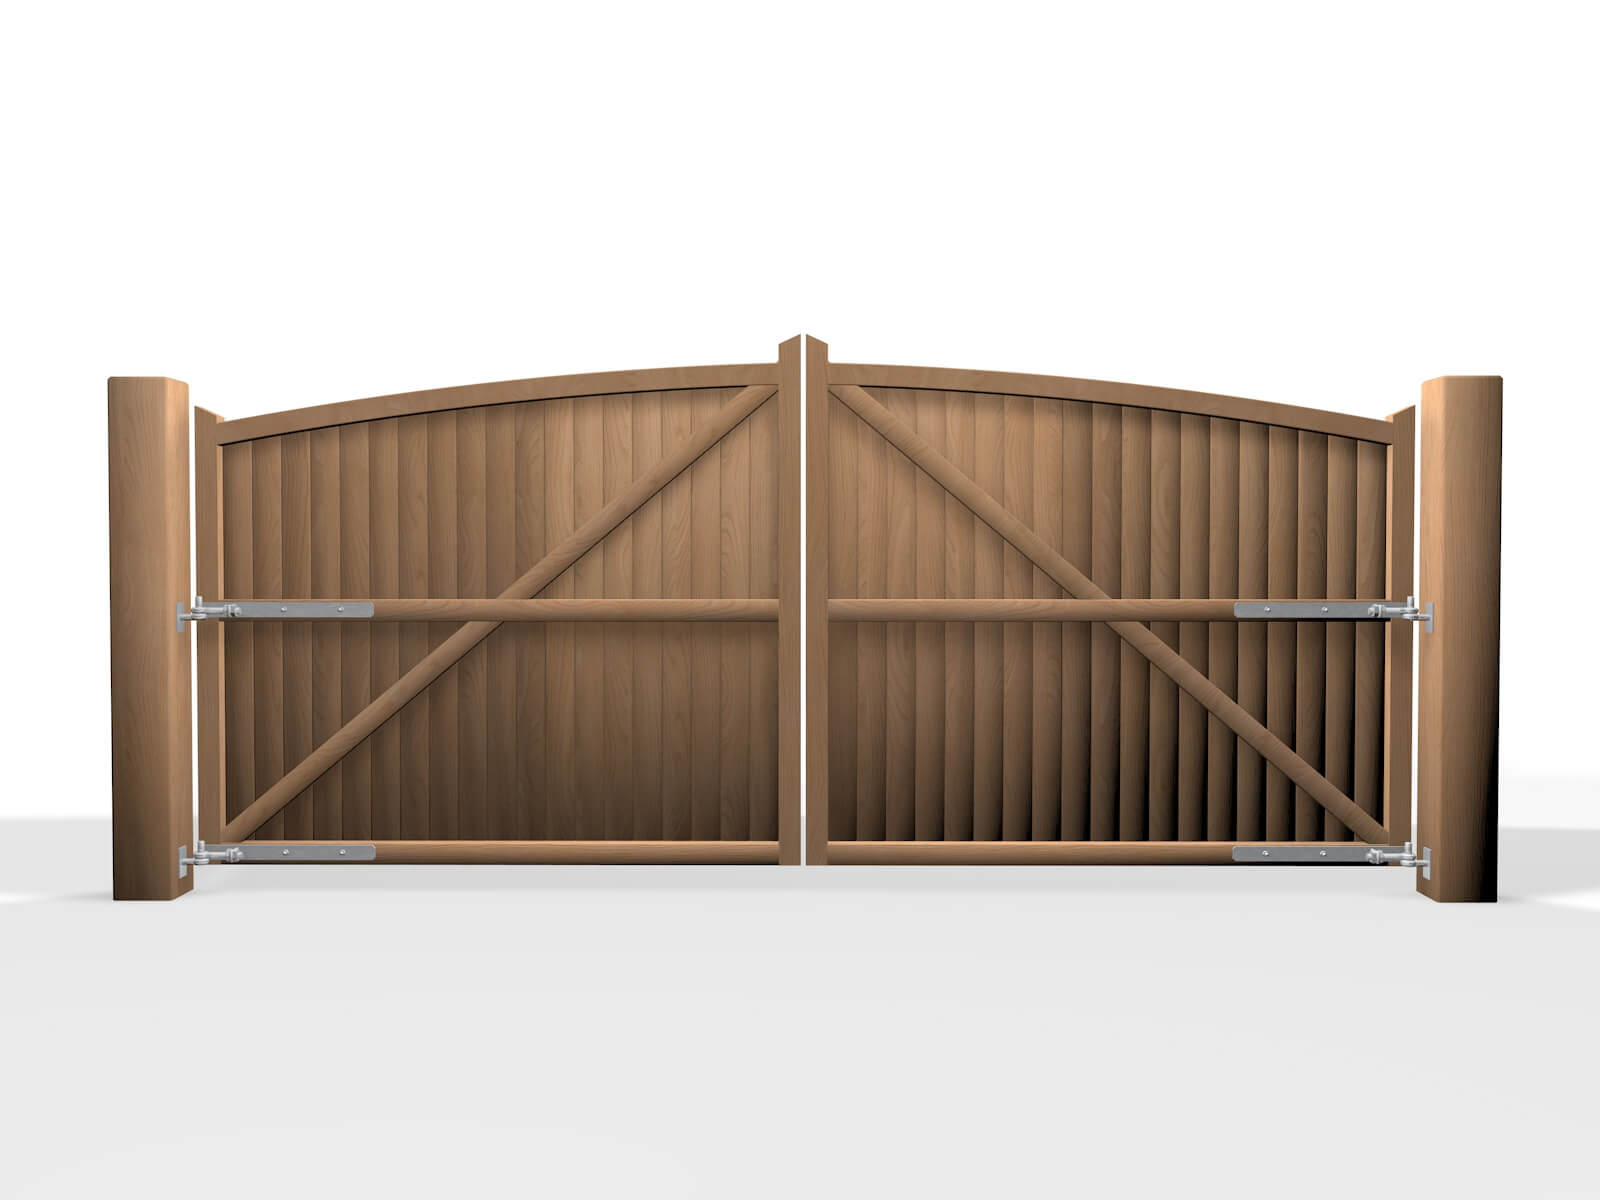 Bristol arch top wooden swinging gate